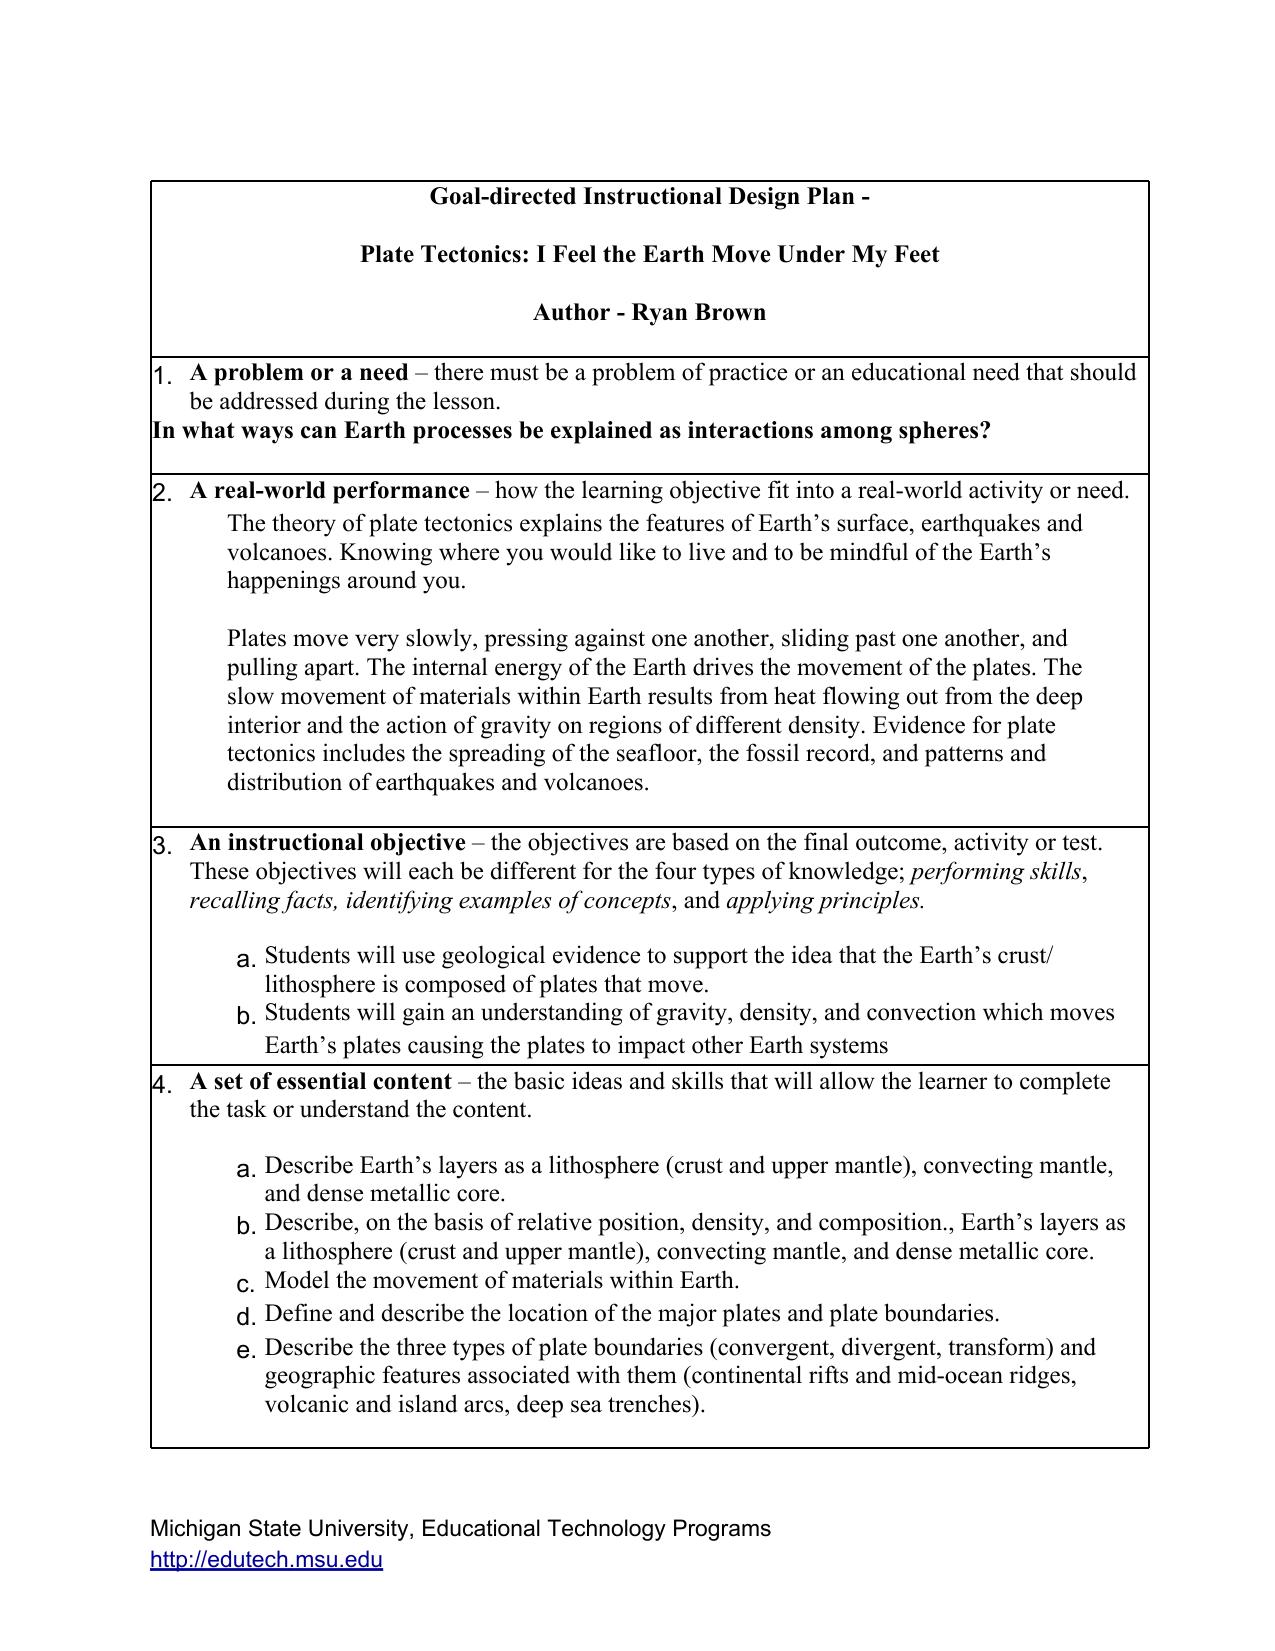 Goal Directed Instructional Design Plan